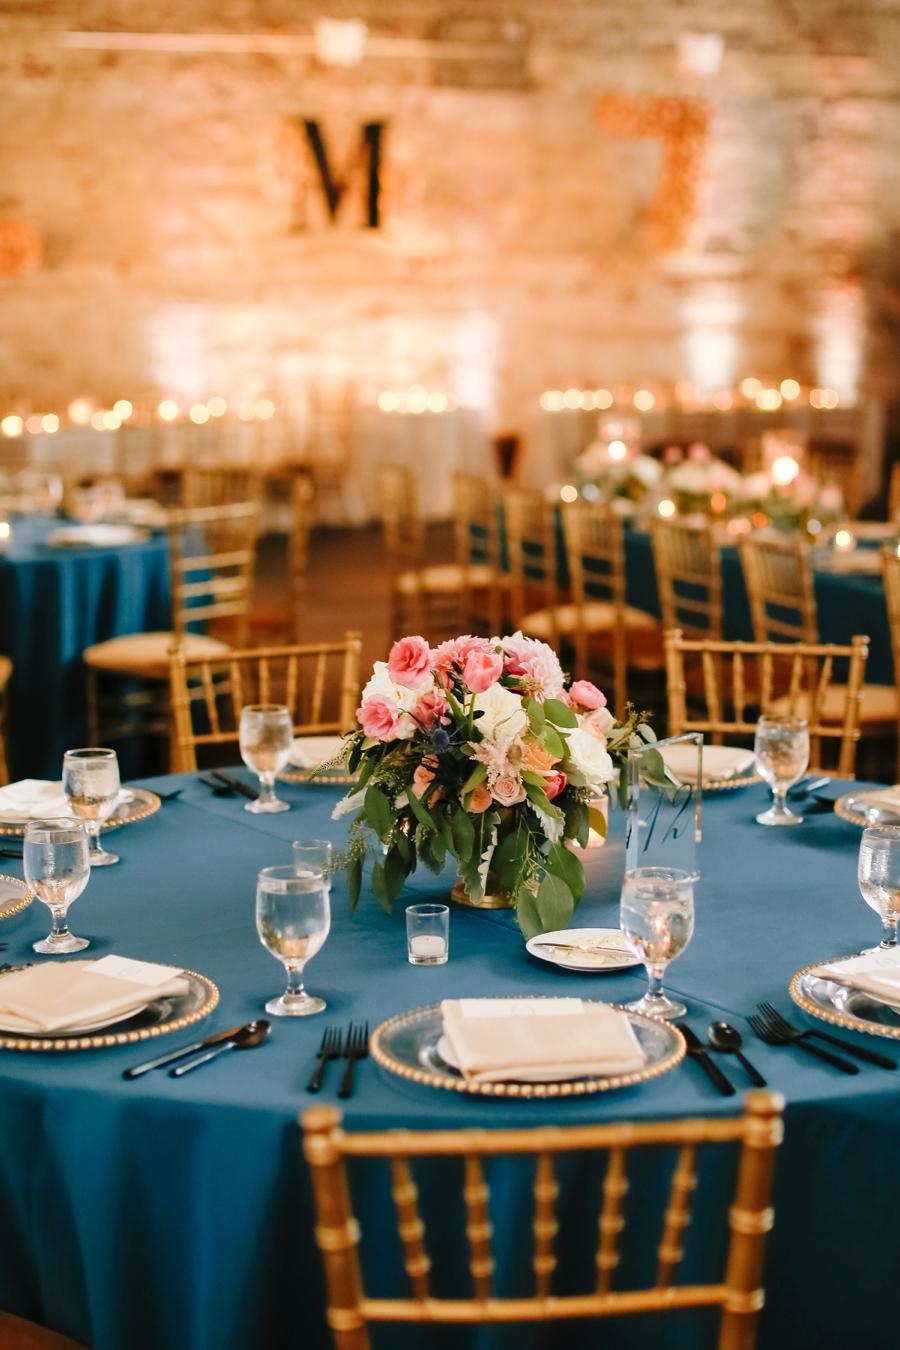 A Romantic Blush & Blue Tampa Wedding via TheELD.com A Romantic Blush & Blue Tampa Wedding - A Romantic Blush Blue Tampa Wedding 0037 - A Romantic Blush & Blue Tampa Wedding